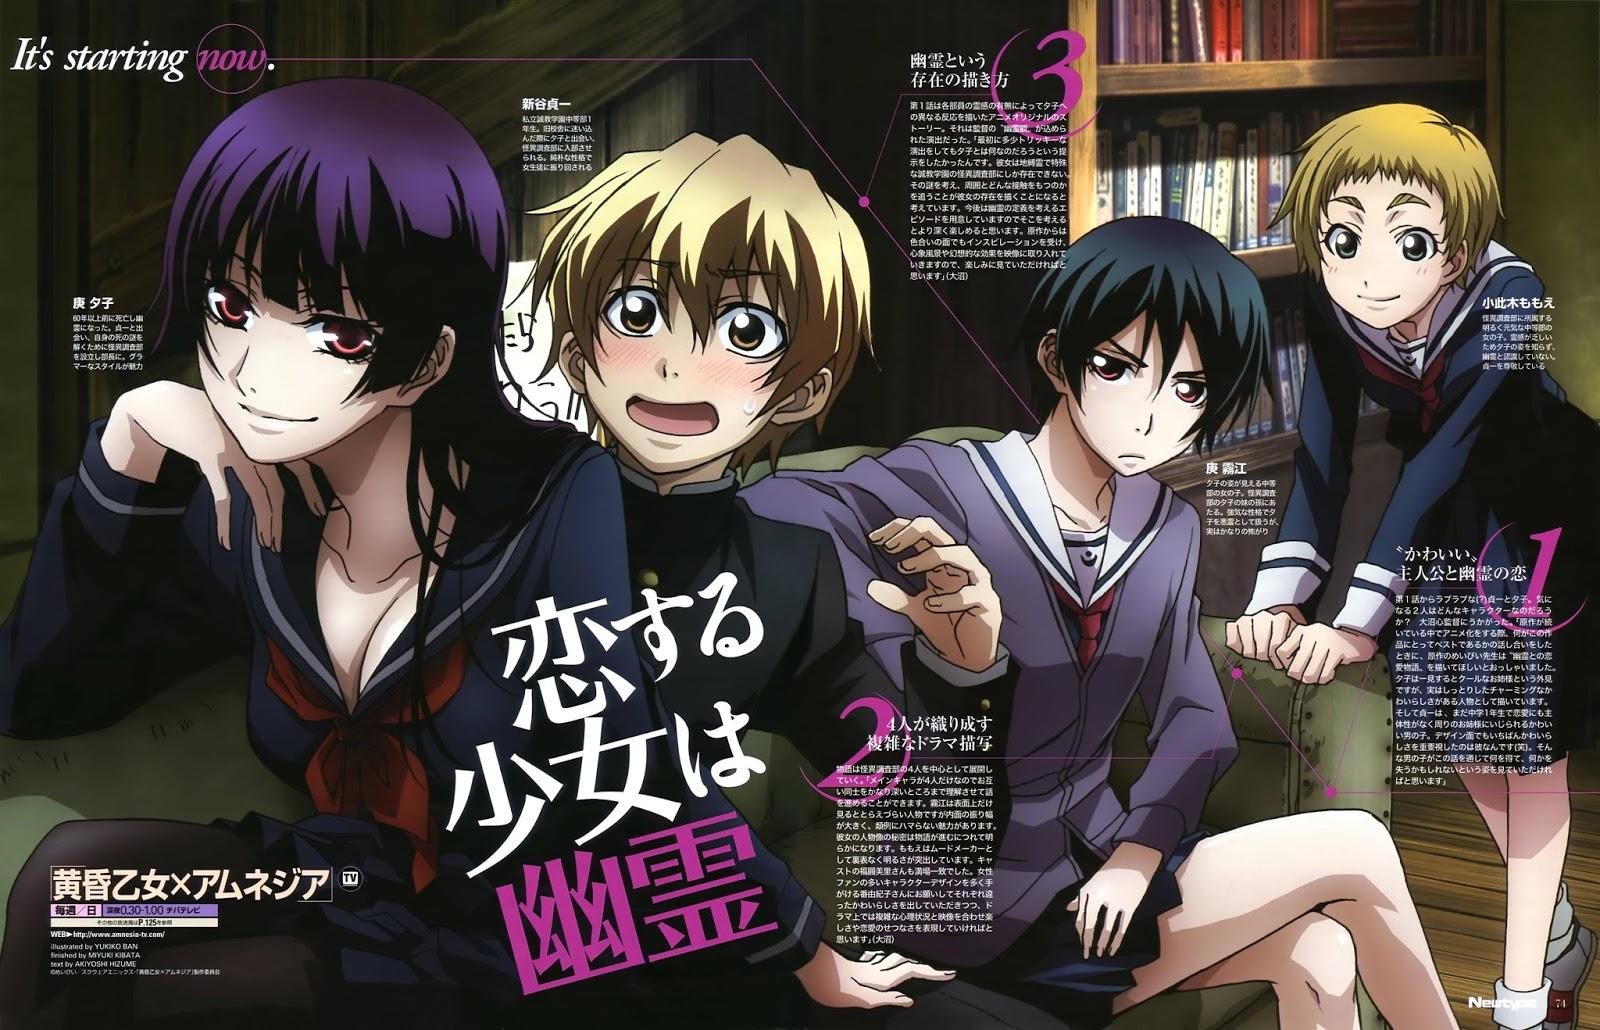 Tasogare Otome X Amnesia Adalah Anime Yang Di Buat Berdasarkan Manganya Pada Tahun 2008 Dan Mendapatkan Adaptasi 2012